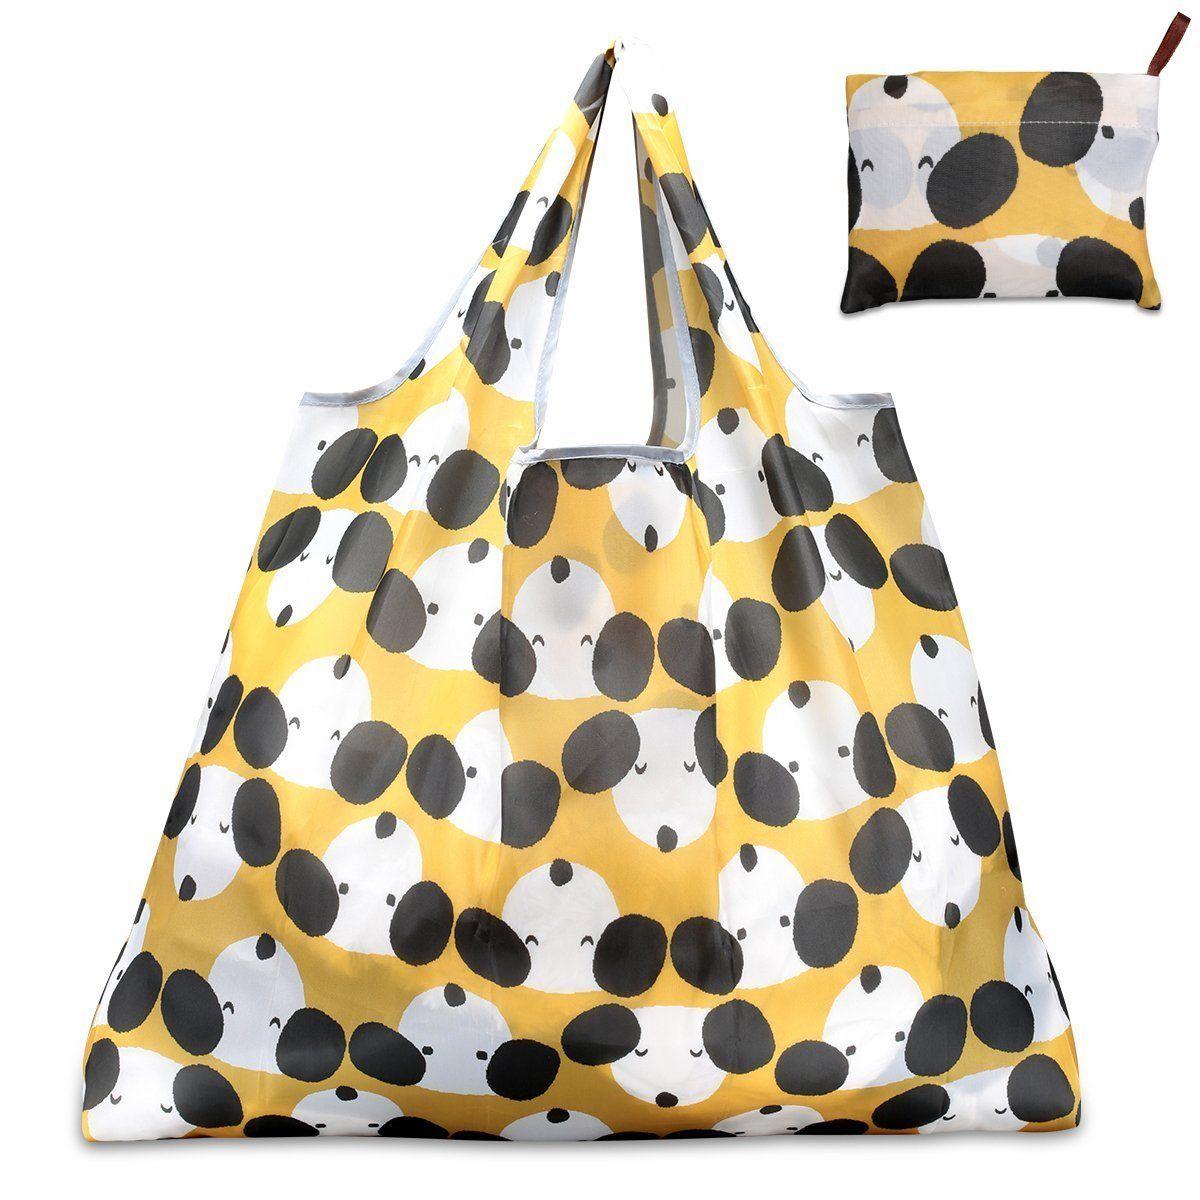 купить 2018 New Foldable Handy Shopping Bag Reusable Cartoon Dog Tote Pouch Recycle Storage Handbags Home Storage Organization Bag по цене 155.71 рублей